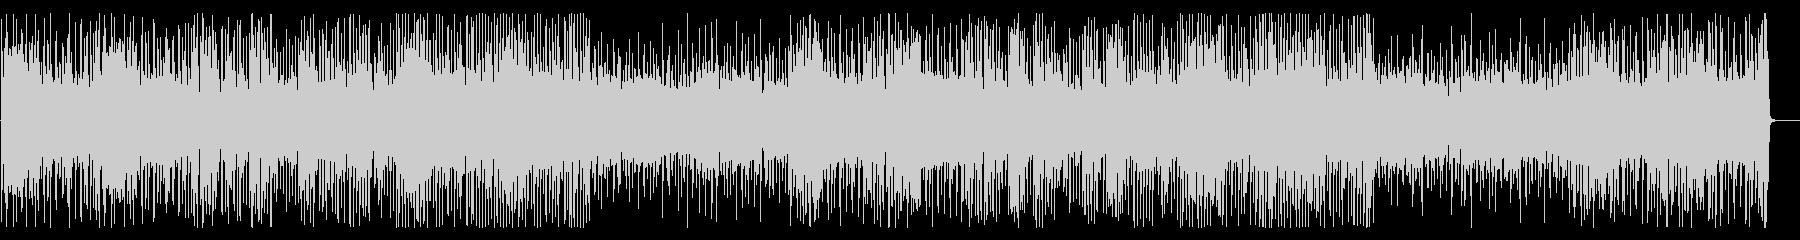 YouTube 軽快で元気なピアノの未再生の波形